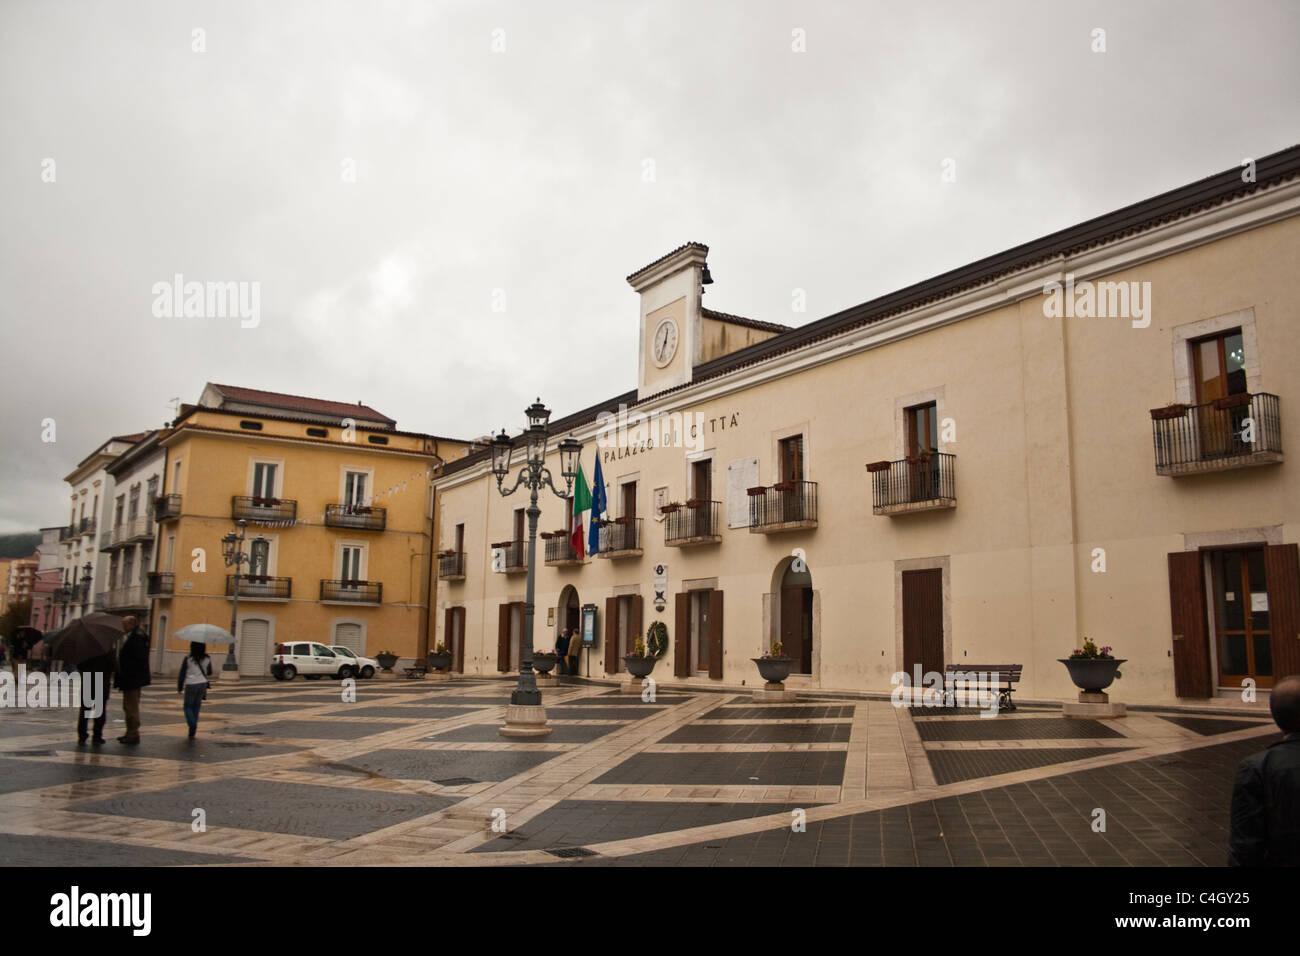 Pietrelcina, Italy - Palazzo di citta - Stock Image